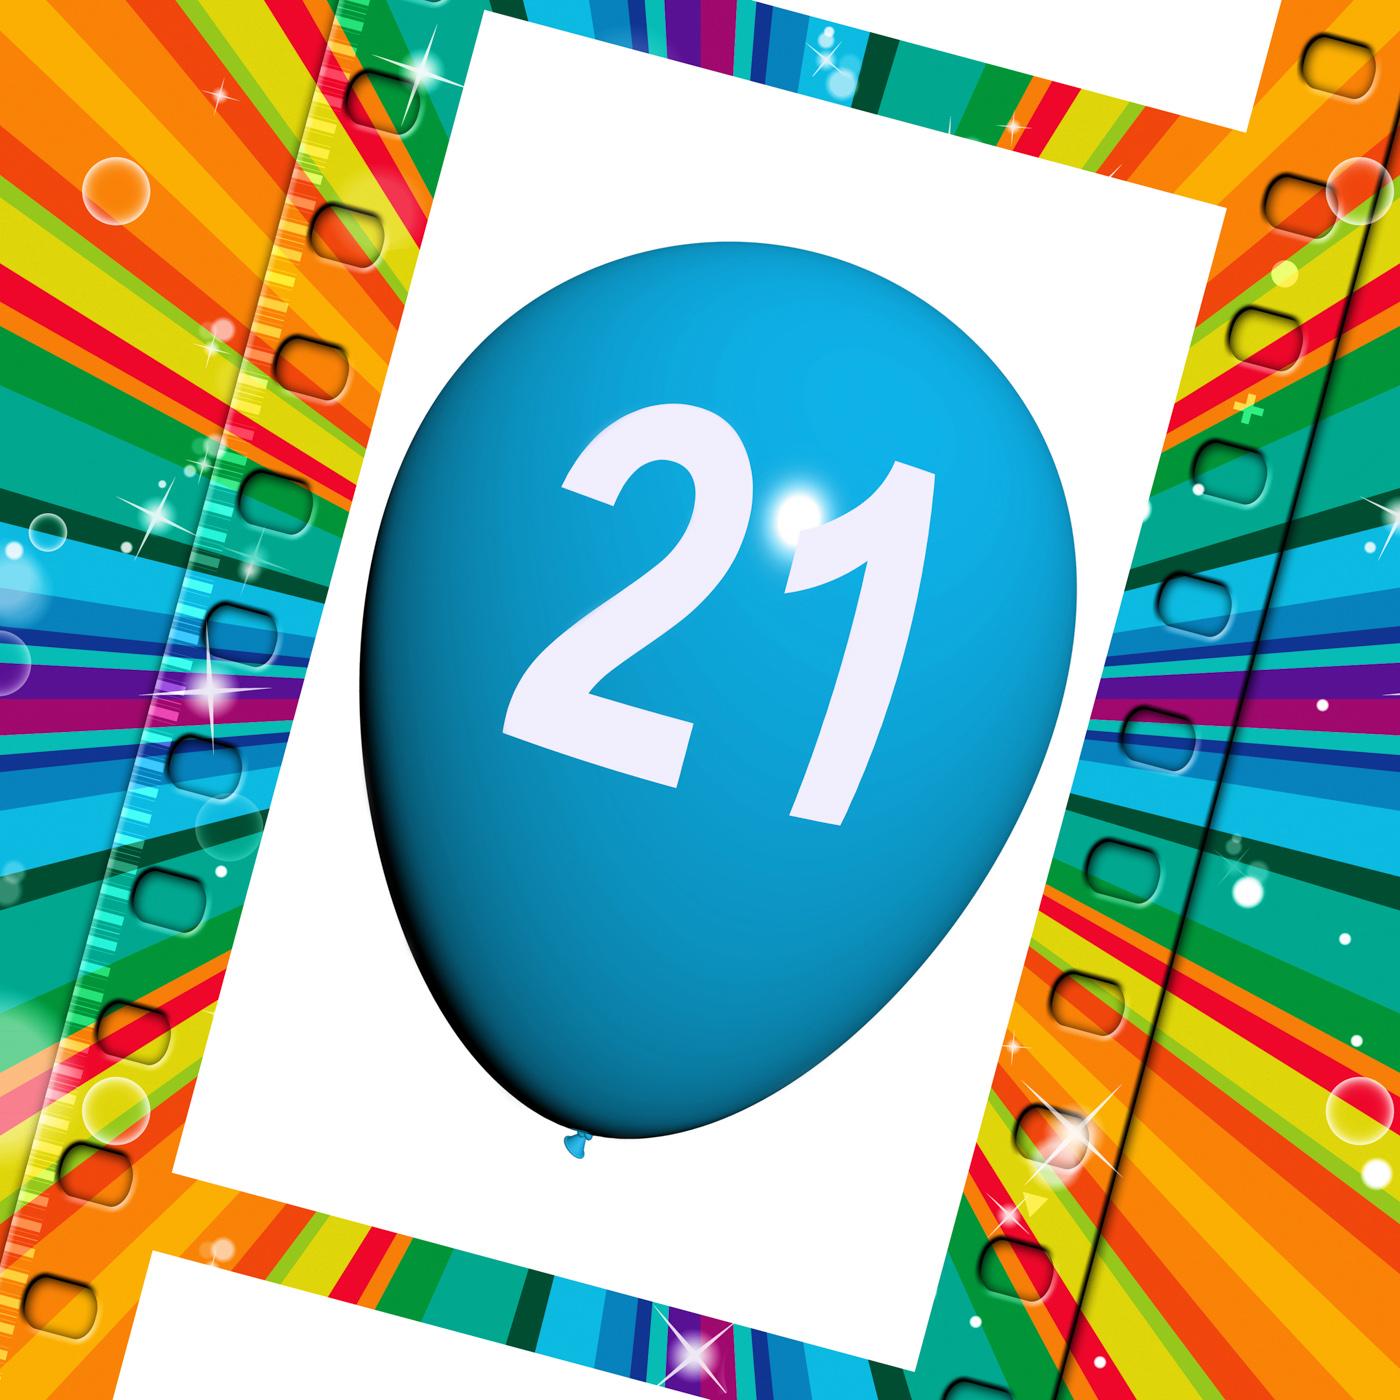 Balloon Shows Twenty-first Happy Birthday Celebrations, 21, 21st, Adult, Adulthood, HQ Photo